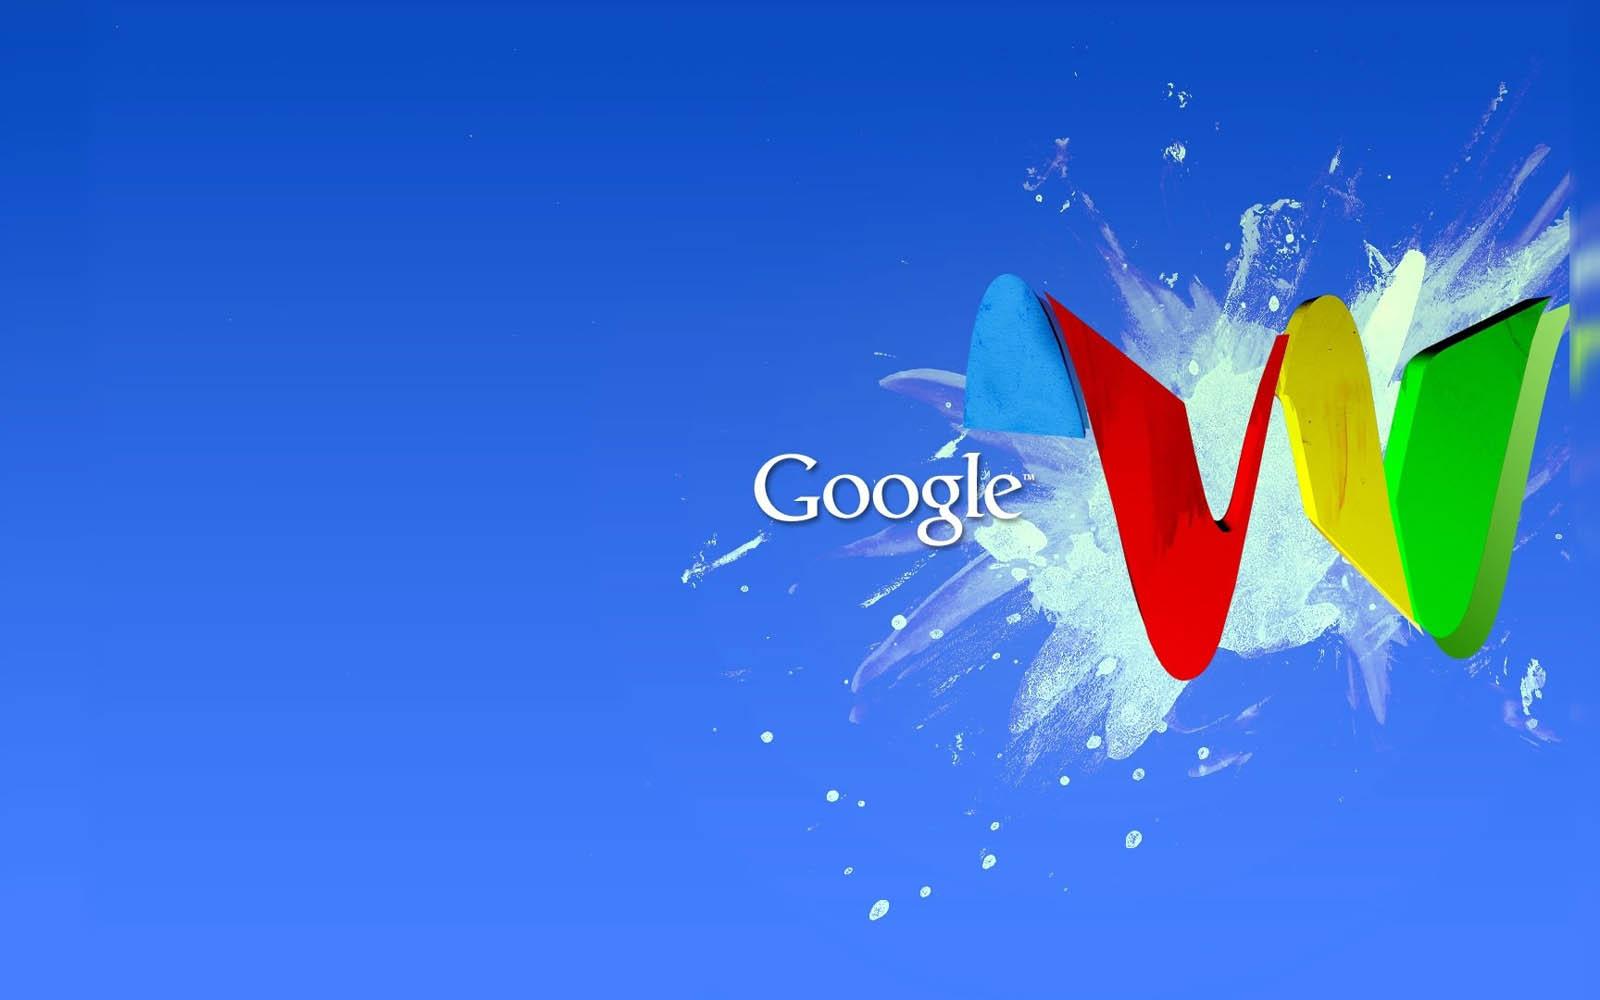 Google Desktop Backgrounds 1600x1000